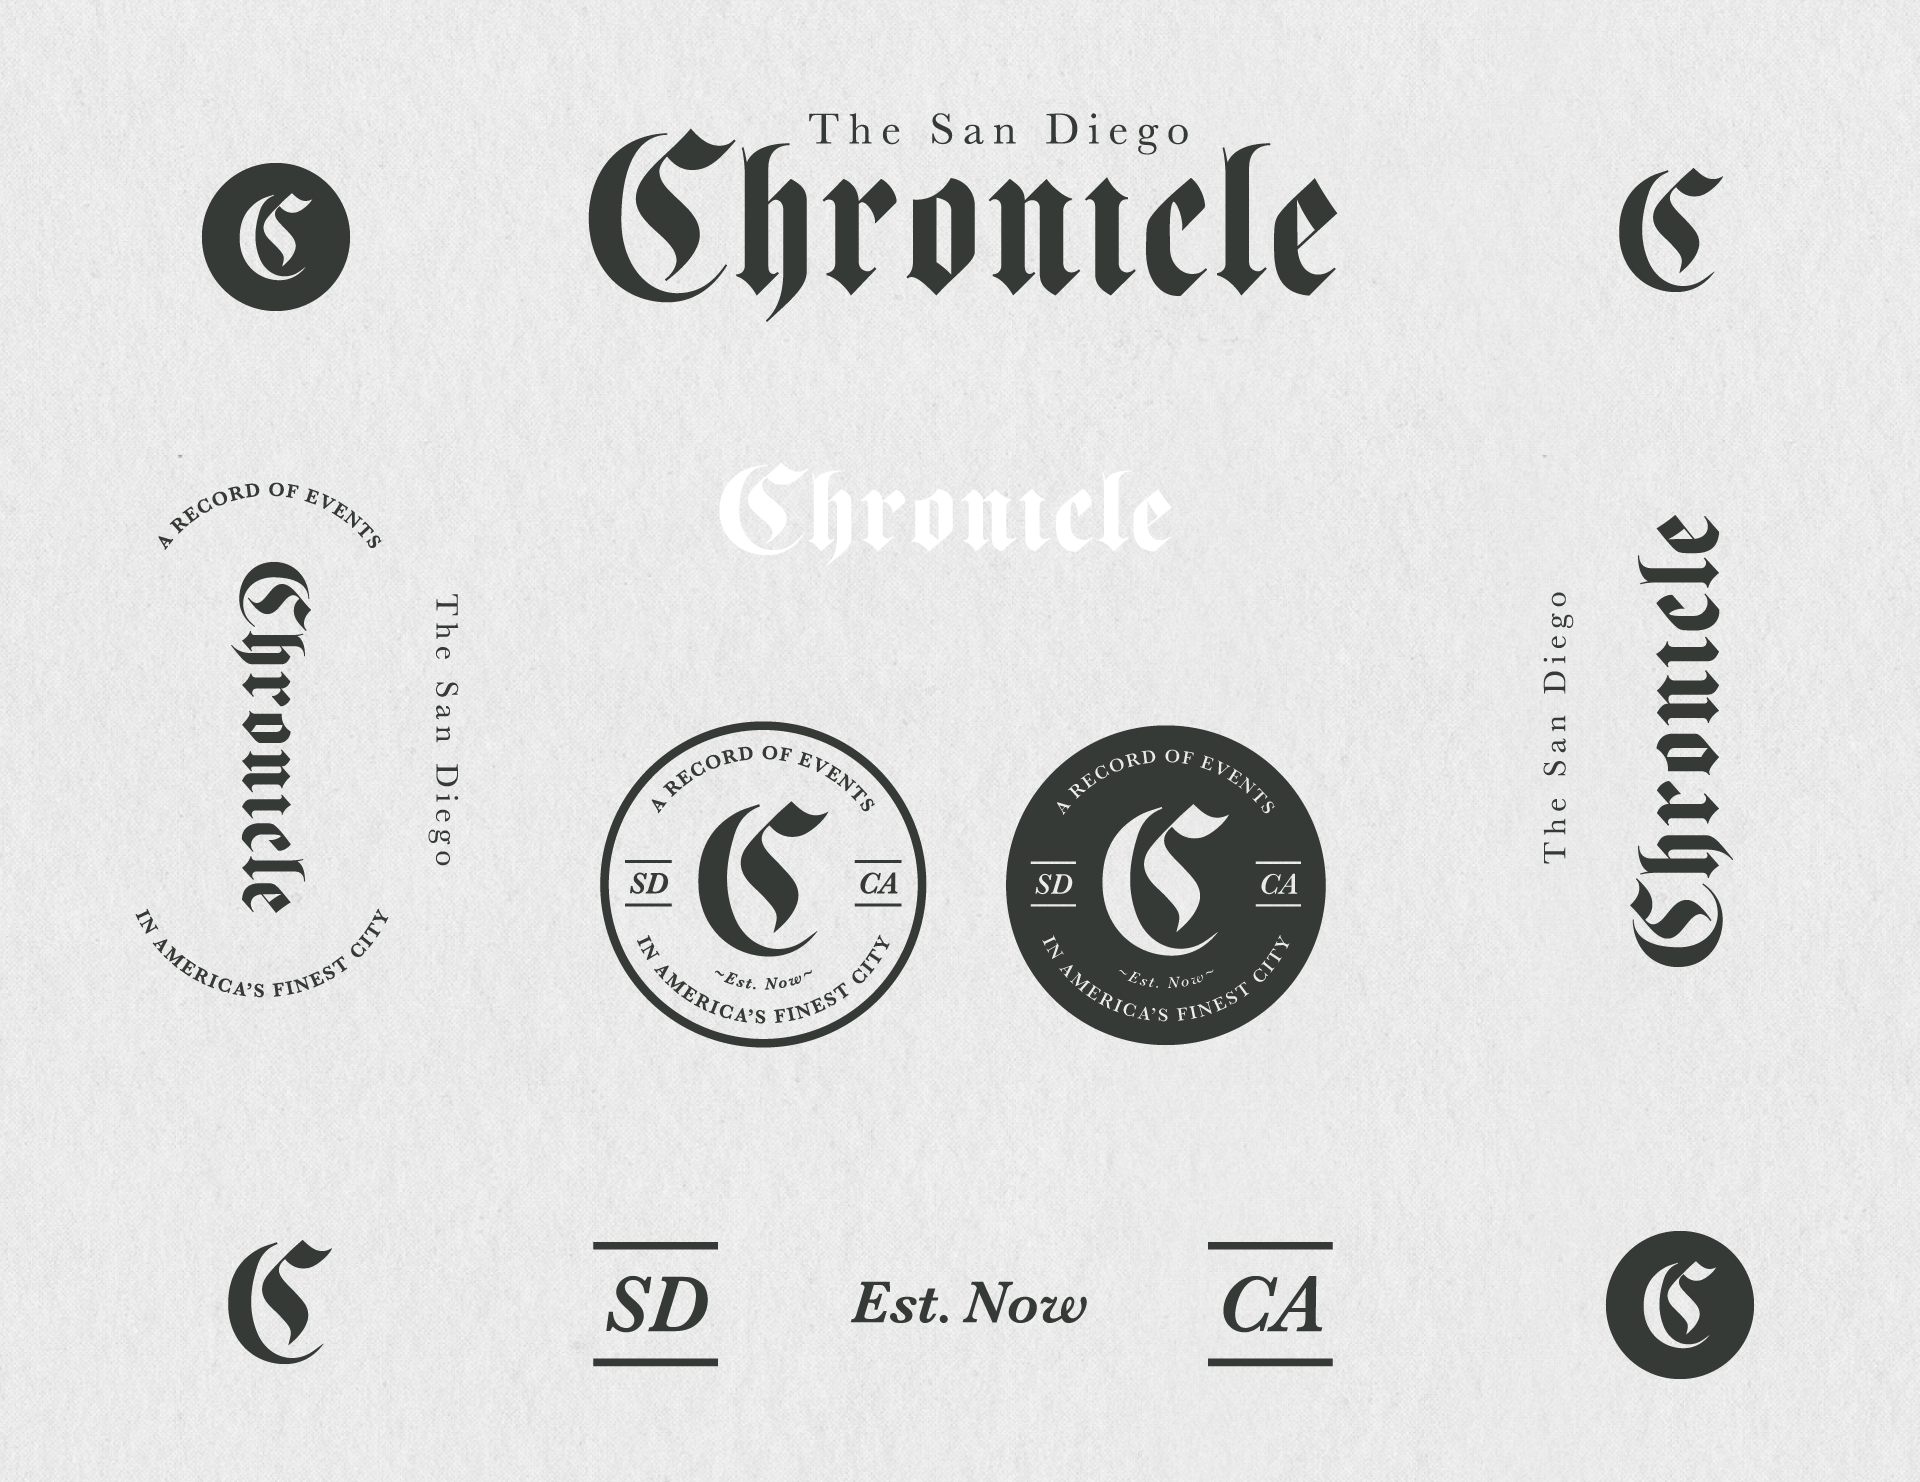 sd-chronical-logos.png